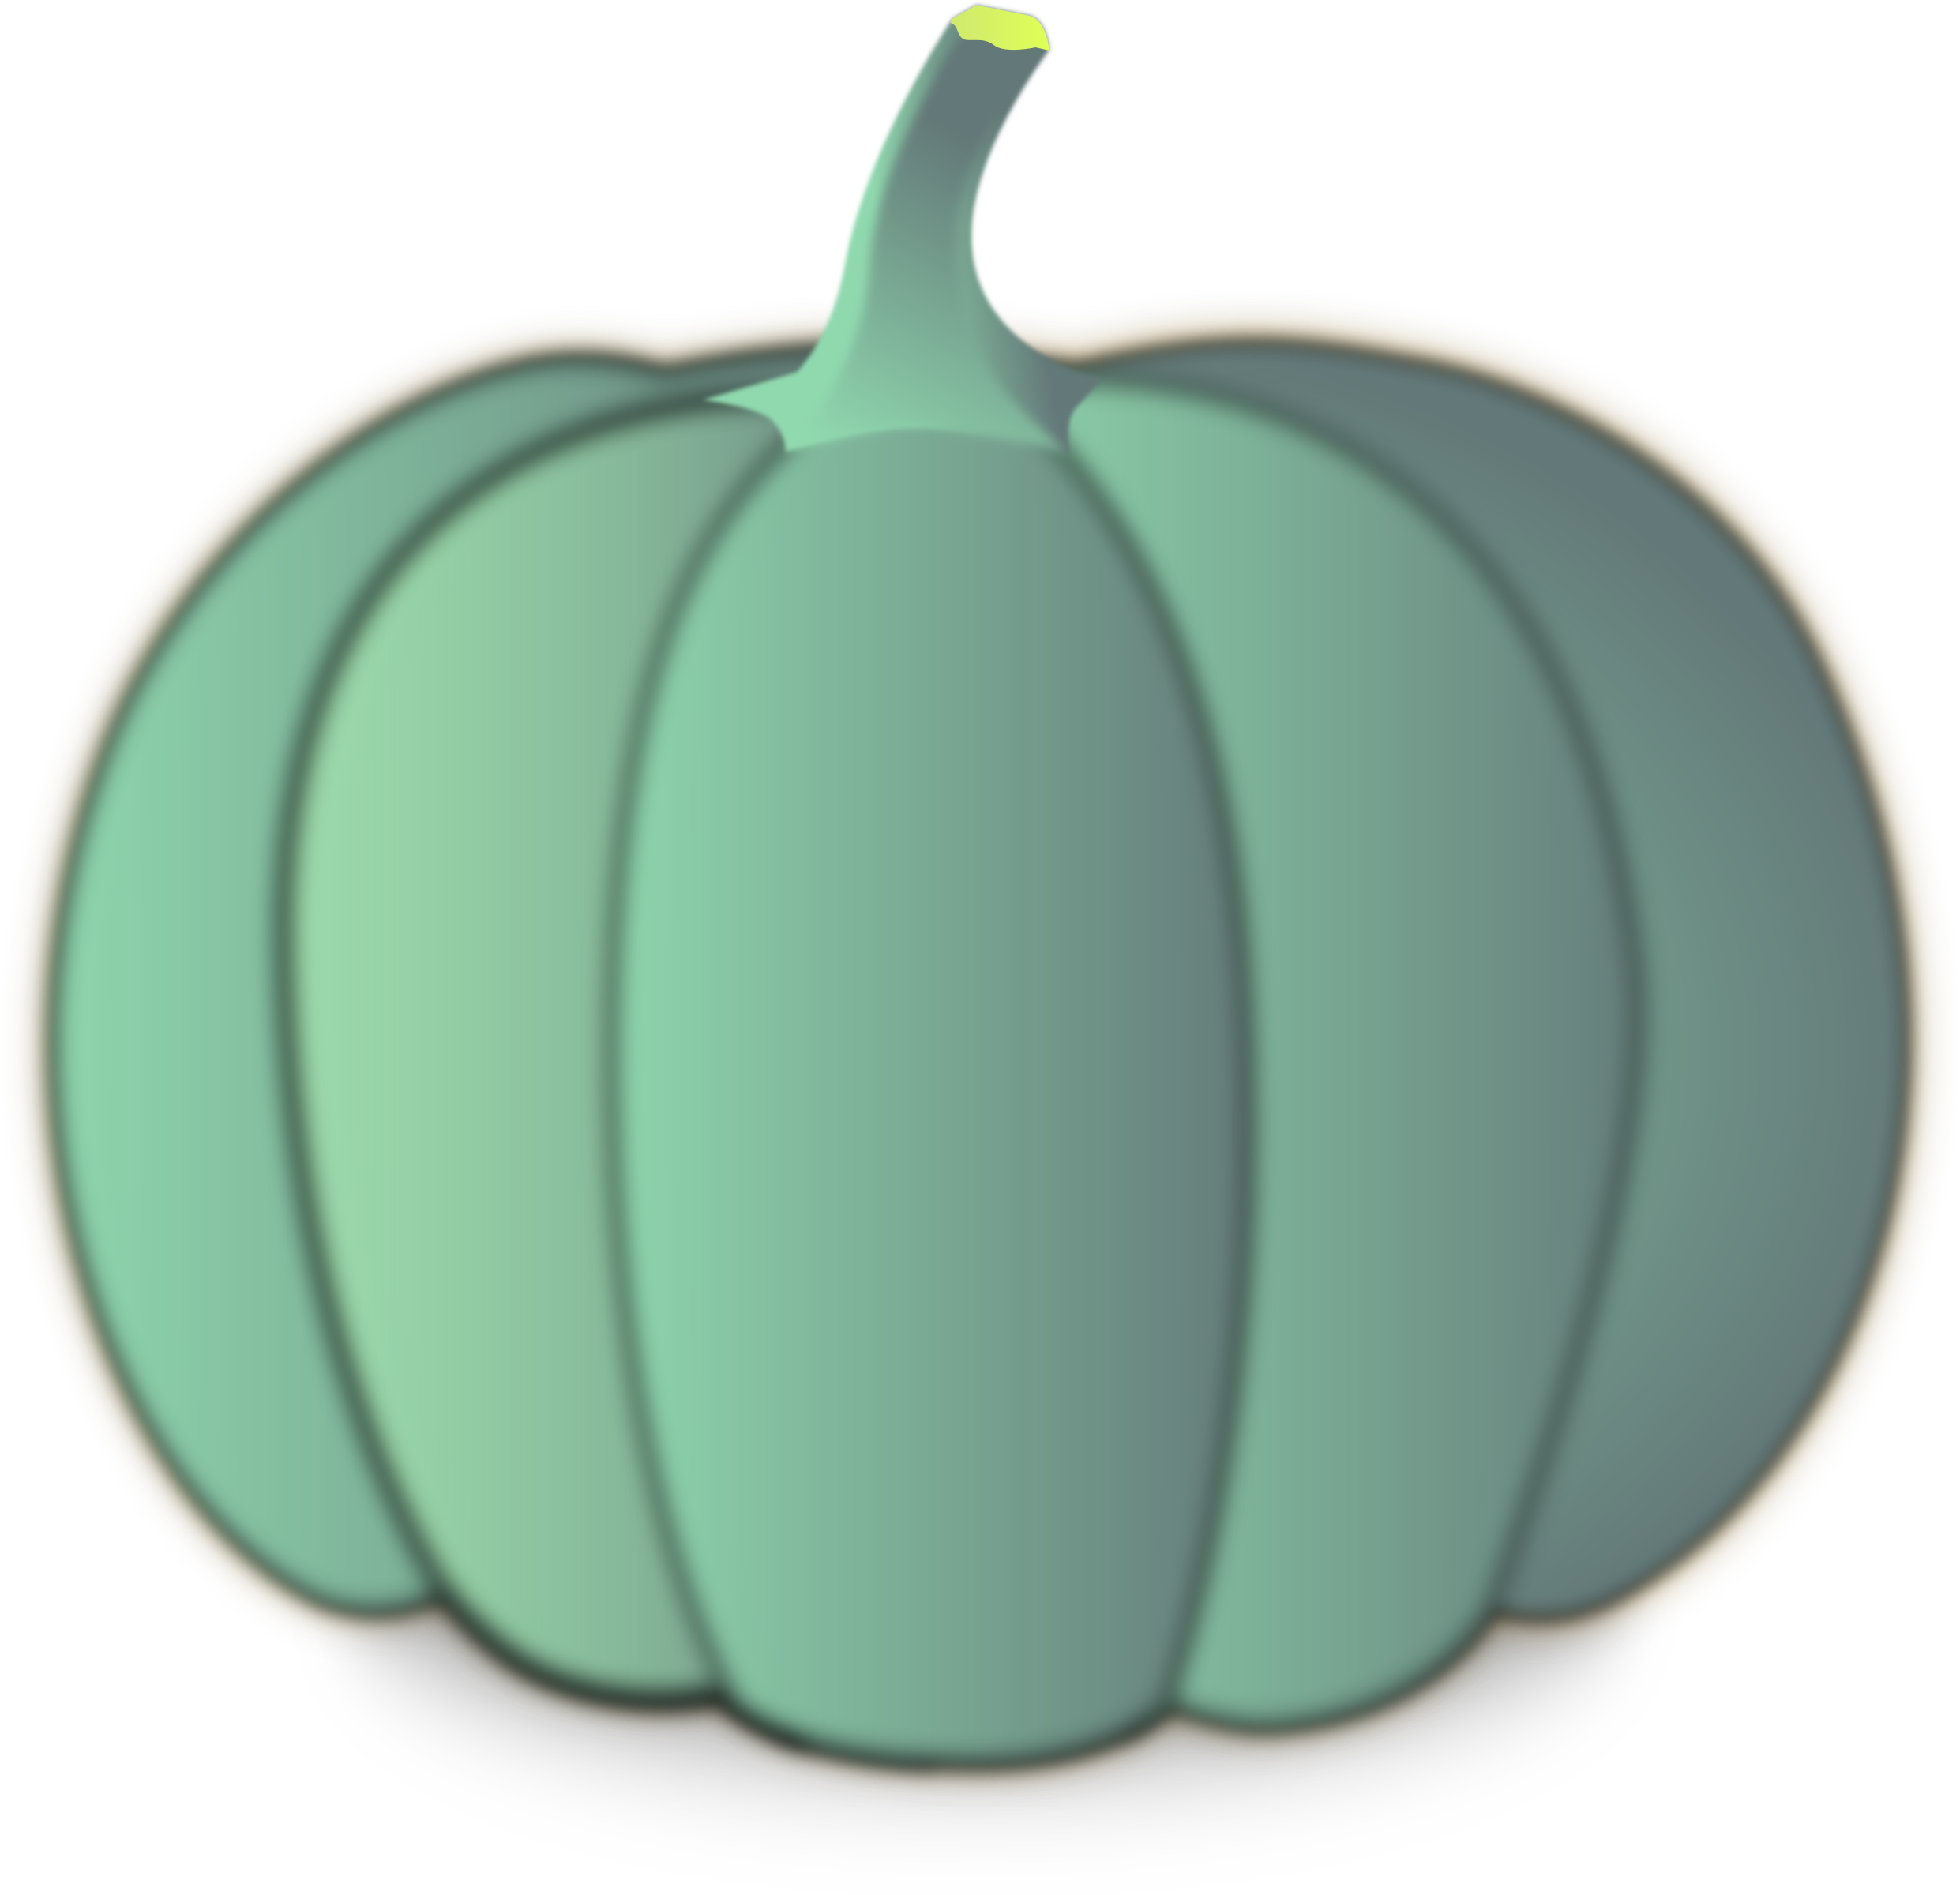 Pumpkin clipart car. A crown big image